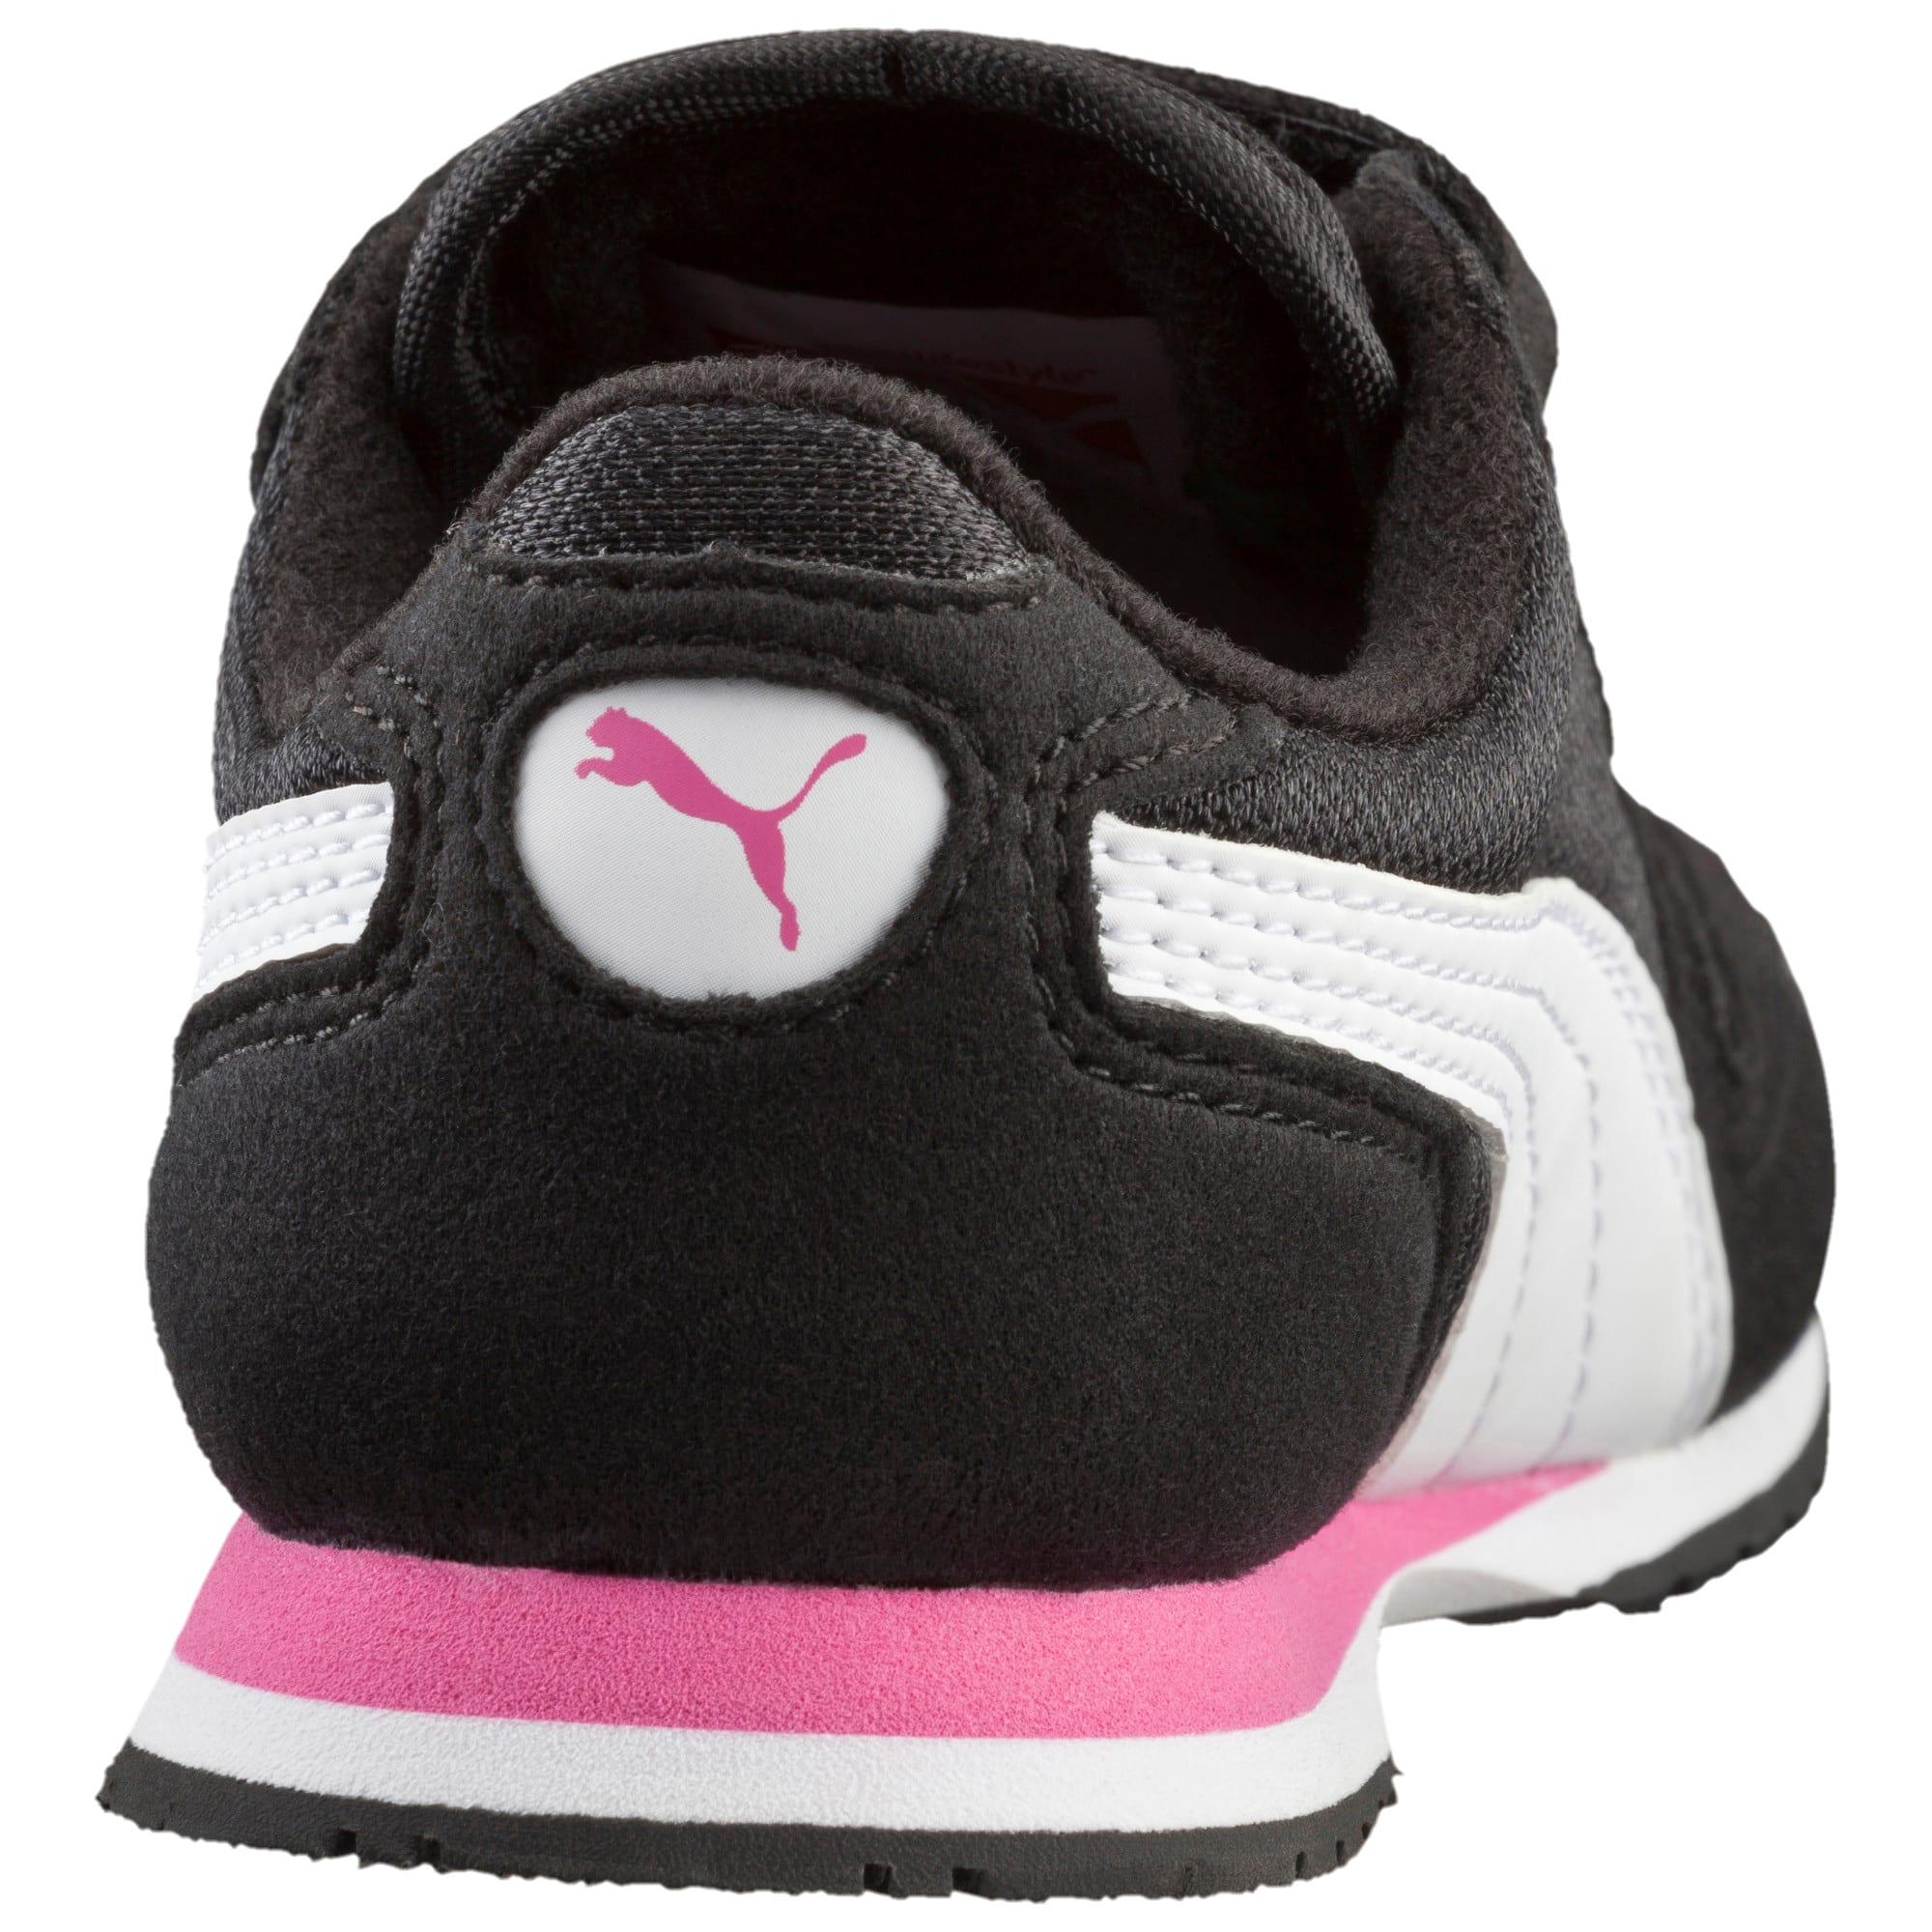 Thumbnail 4 of Cabana Racer Mesh AC Toddler Shoes, black-white-carmine rose, medium